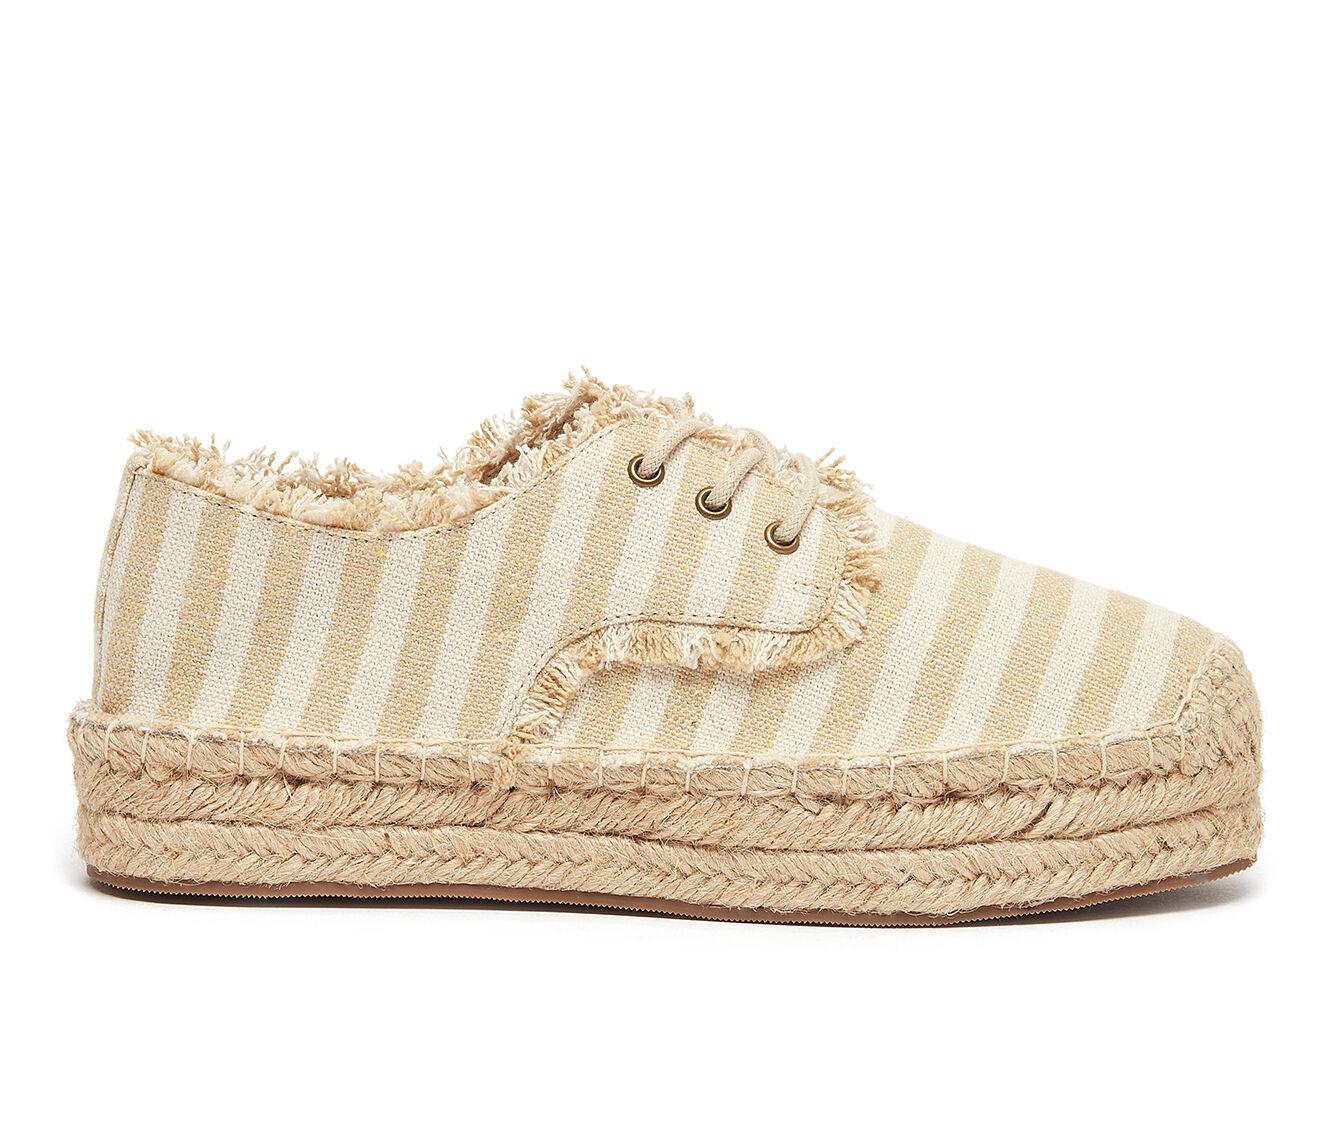 uk shoes_kd4564